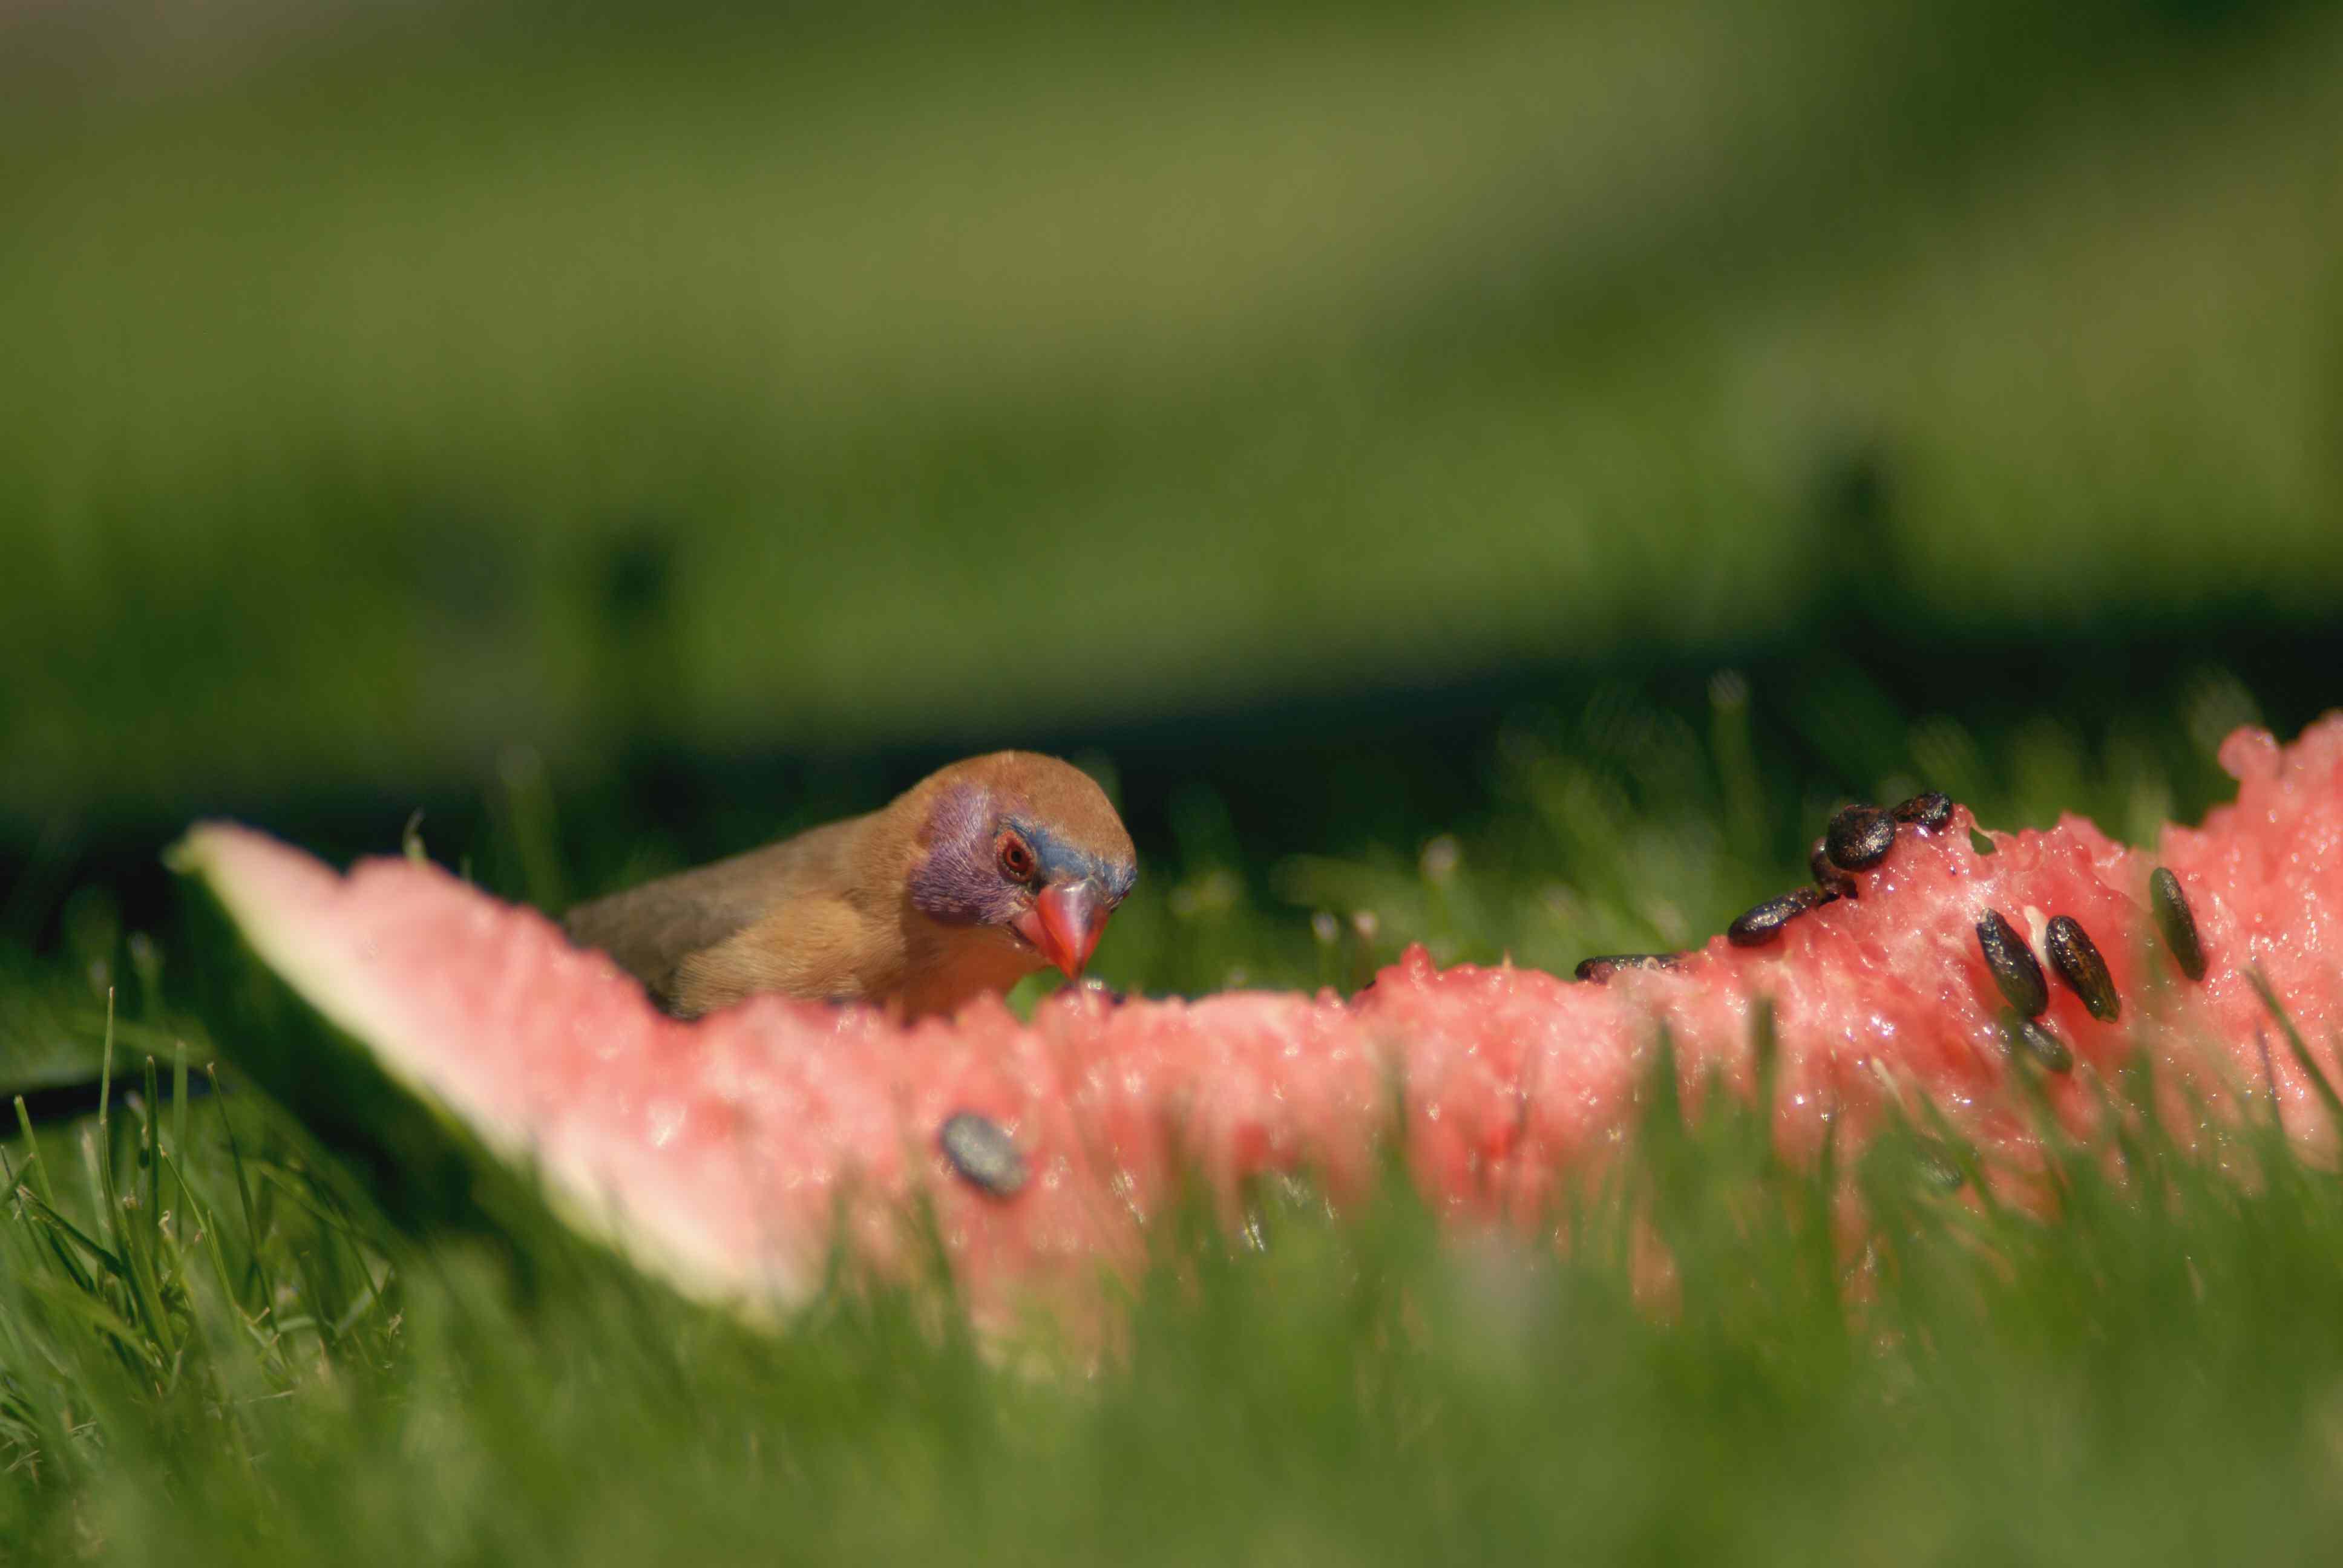 Bird eating watermelon (Citrullus lanatus) on ground